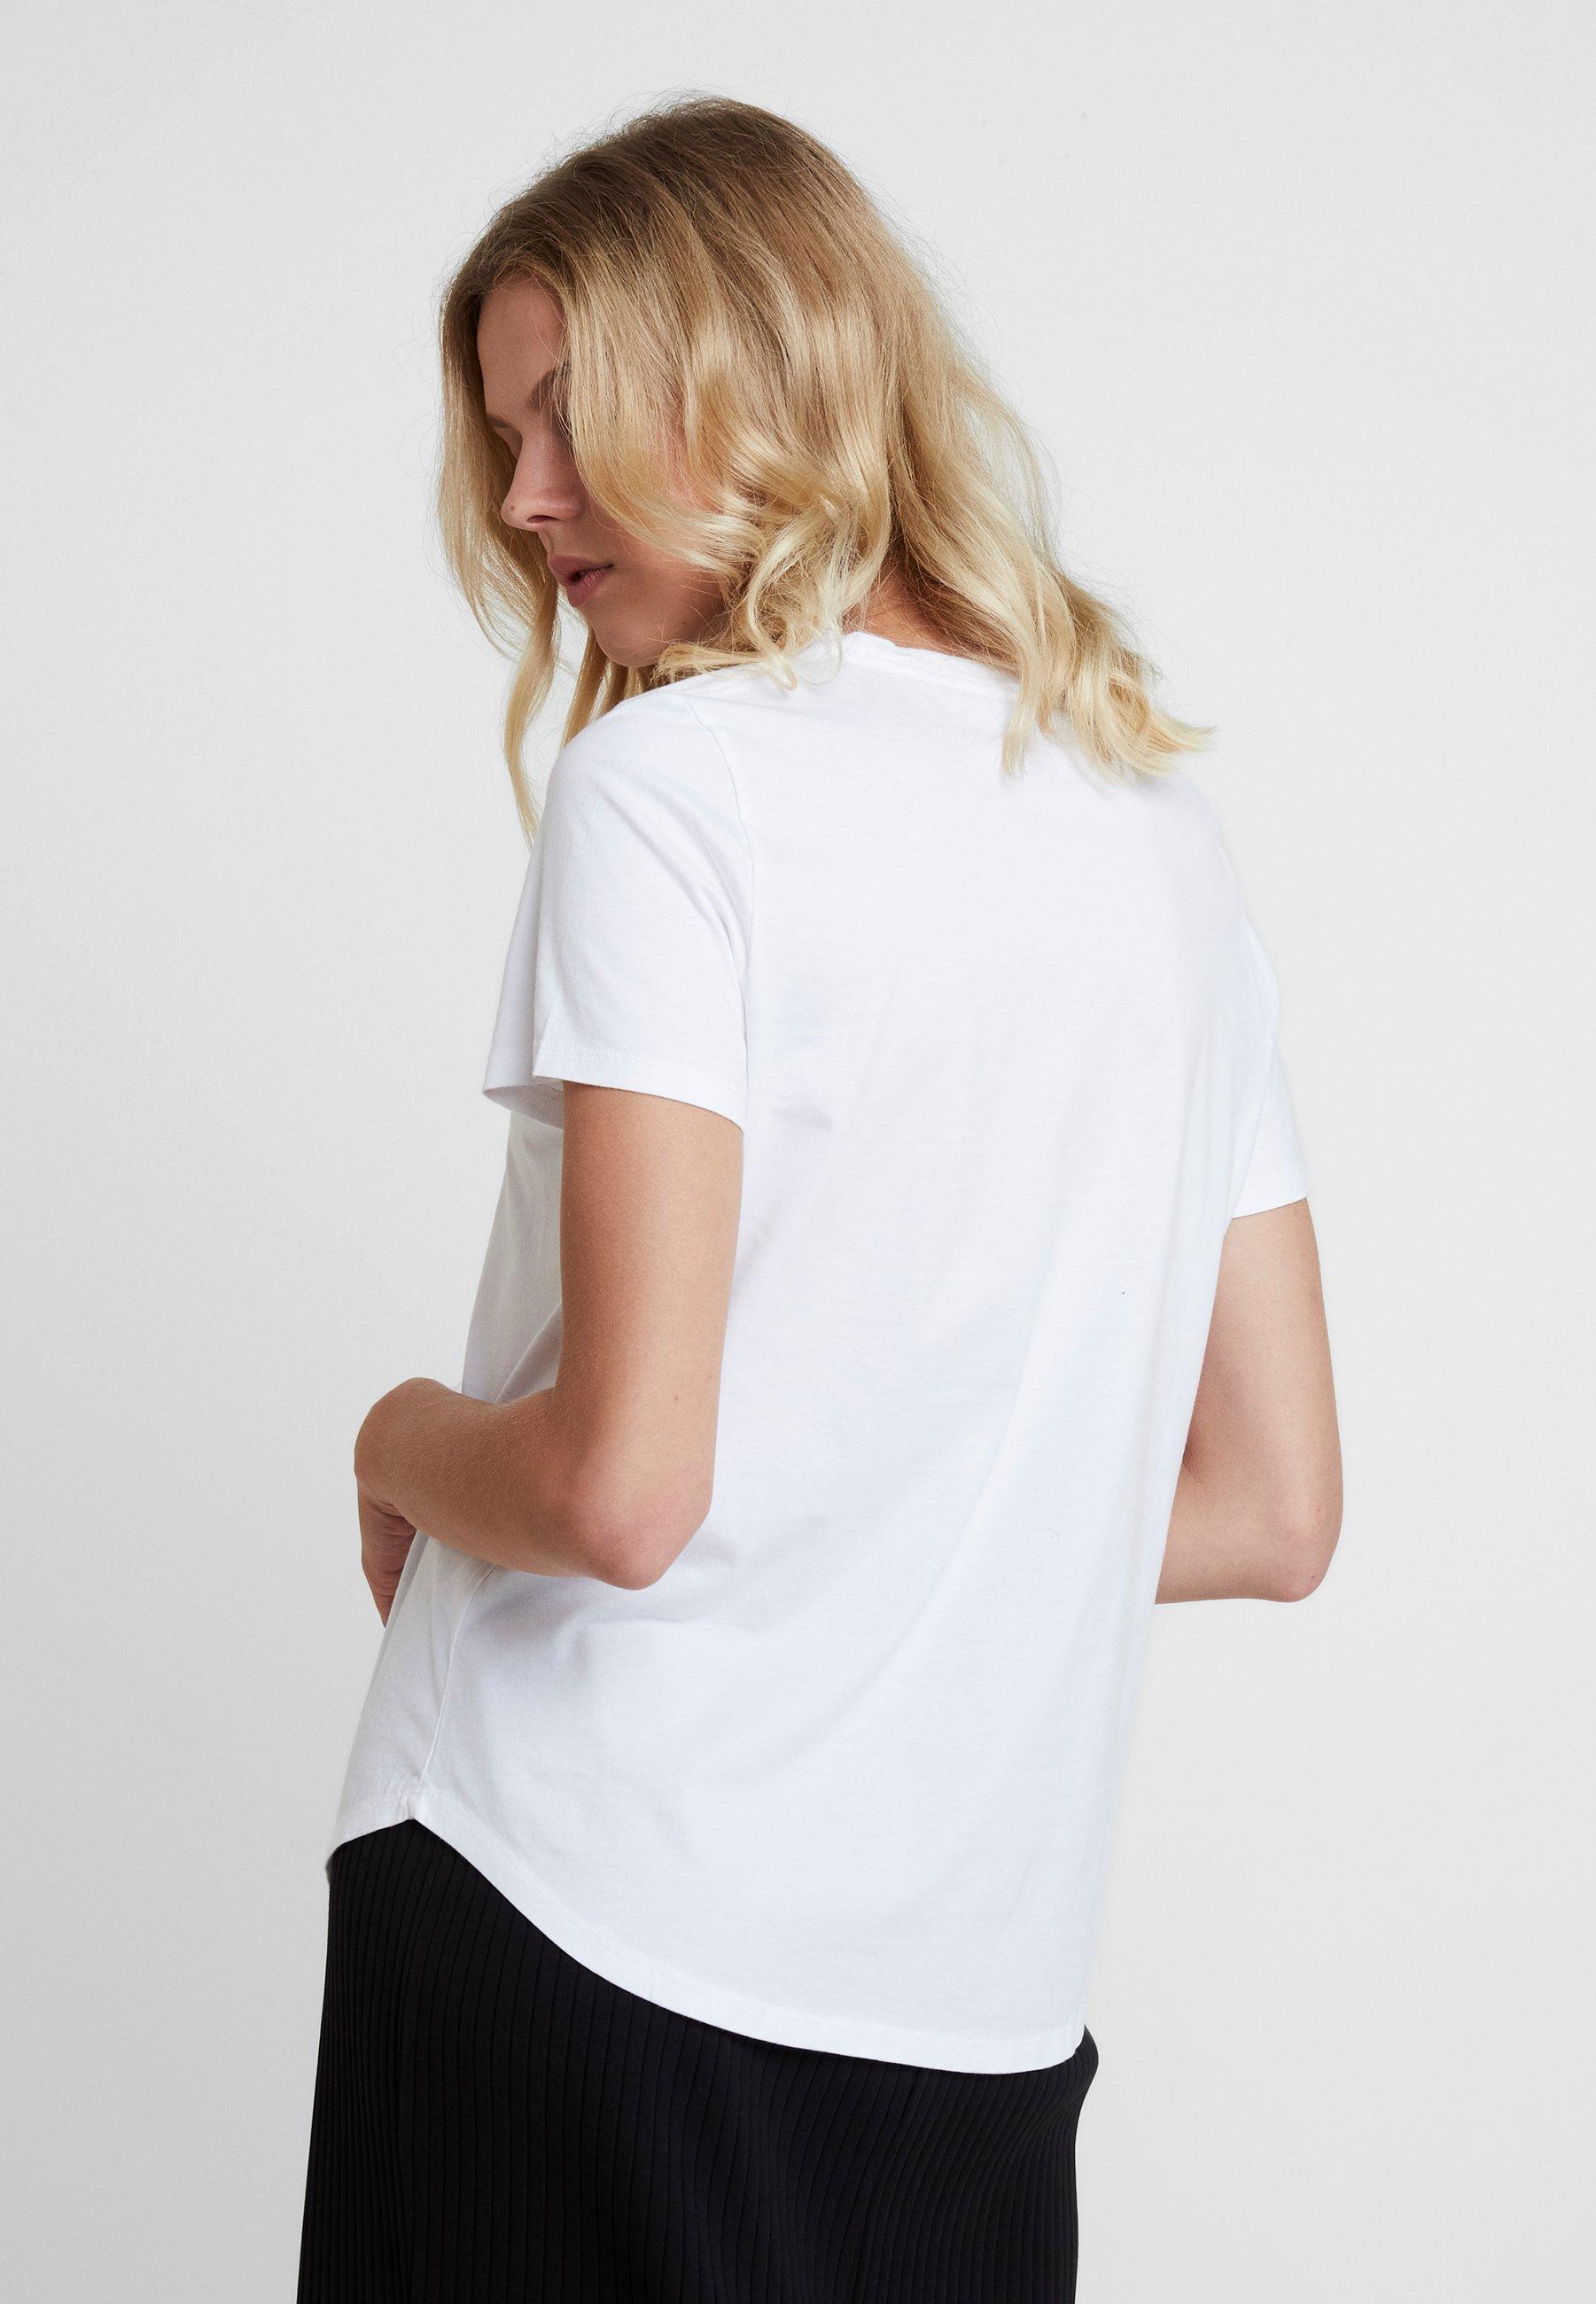 Banana Imprimé White shirt Crew Republic Si BonT Supima Cest UVpSzM